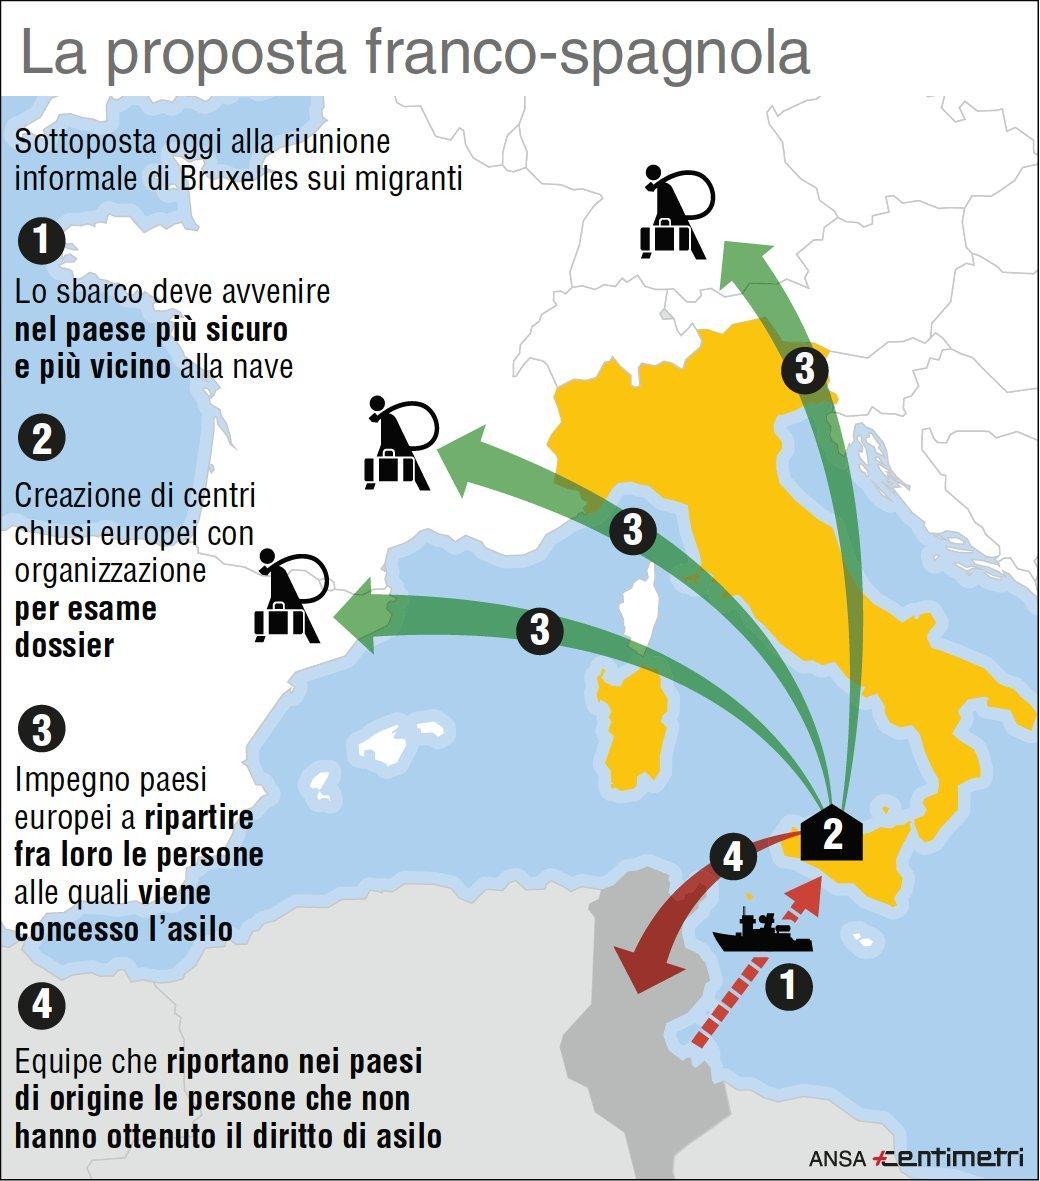 Sbarchi migranti, la proposta franco-spagnola